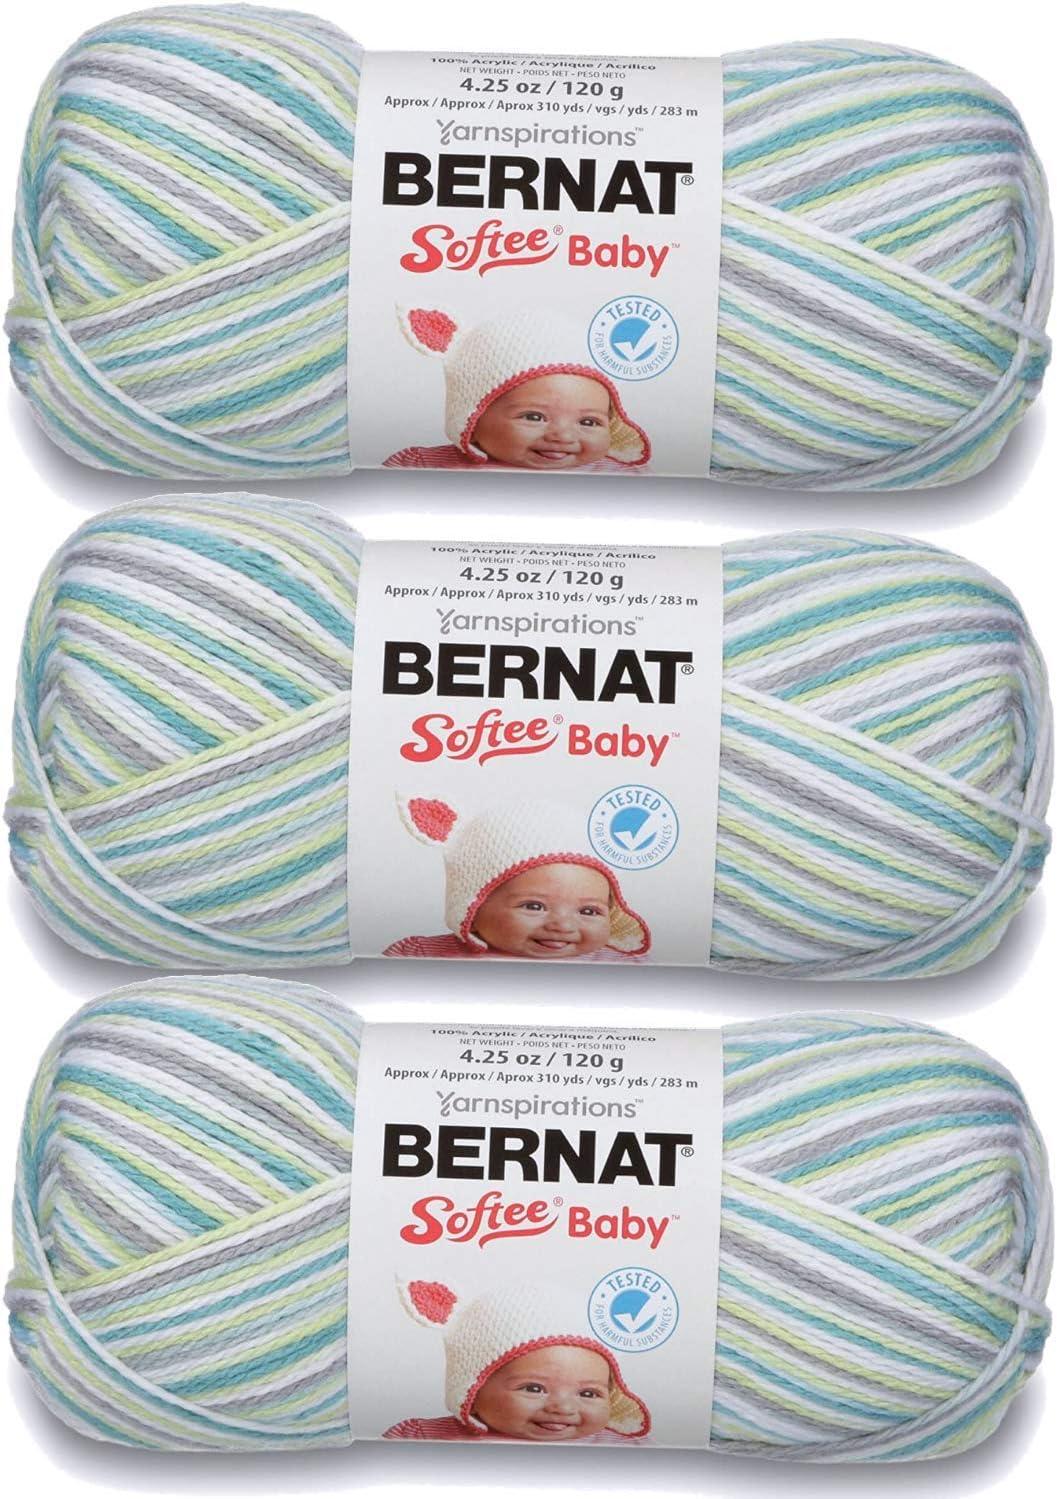 Bernat Softee Baby Yarn Ombres (3-Pack) Prince Pebbles 166031-31201